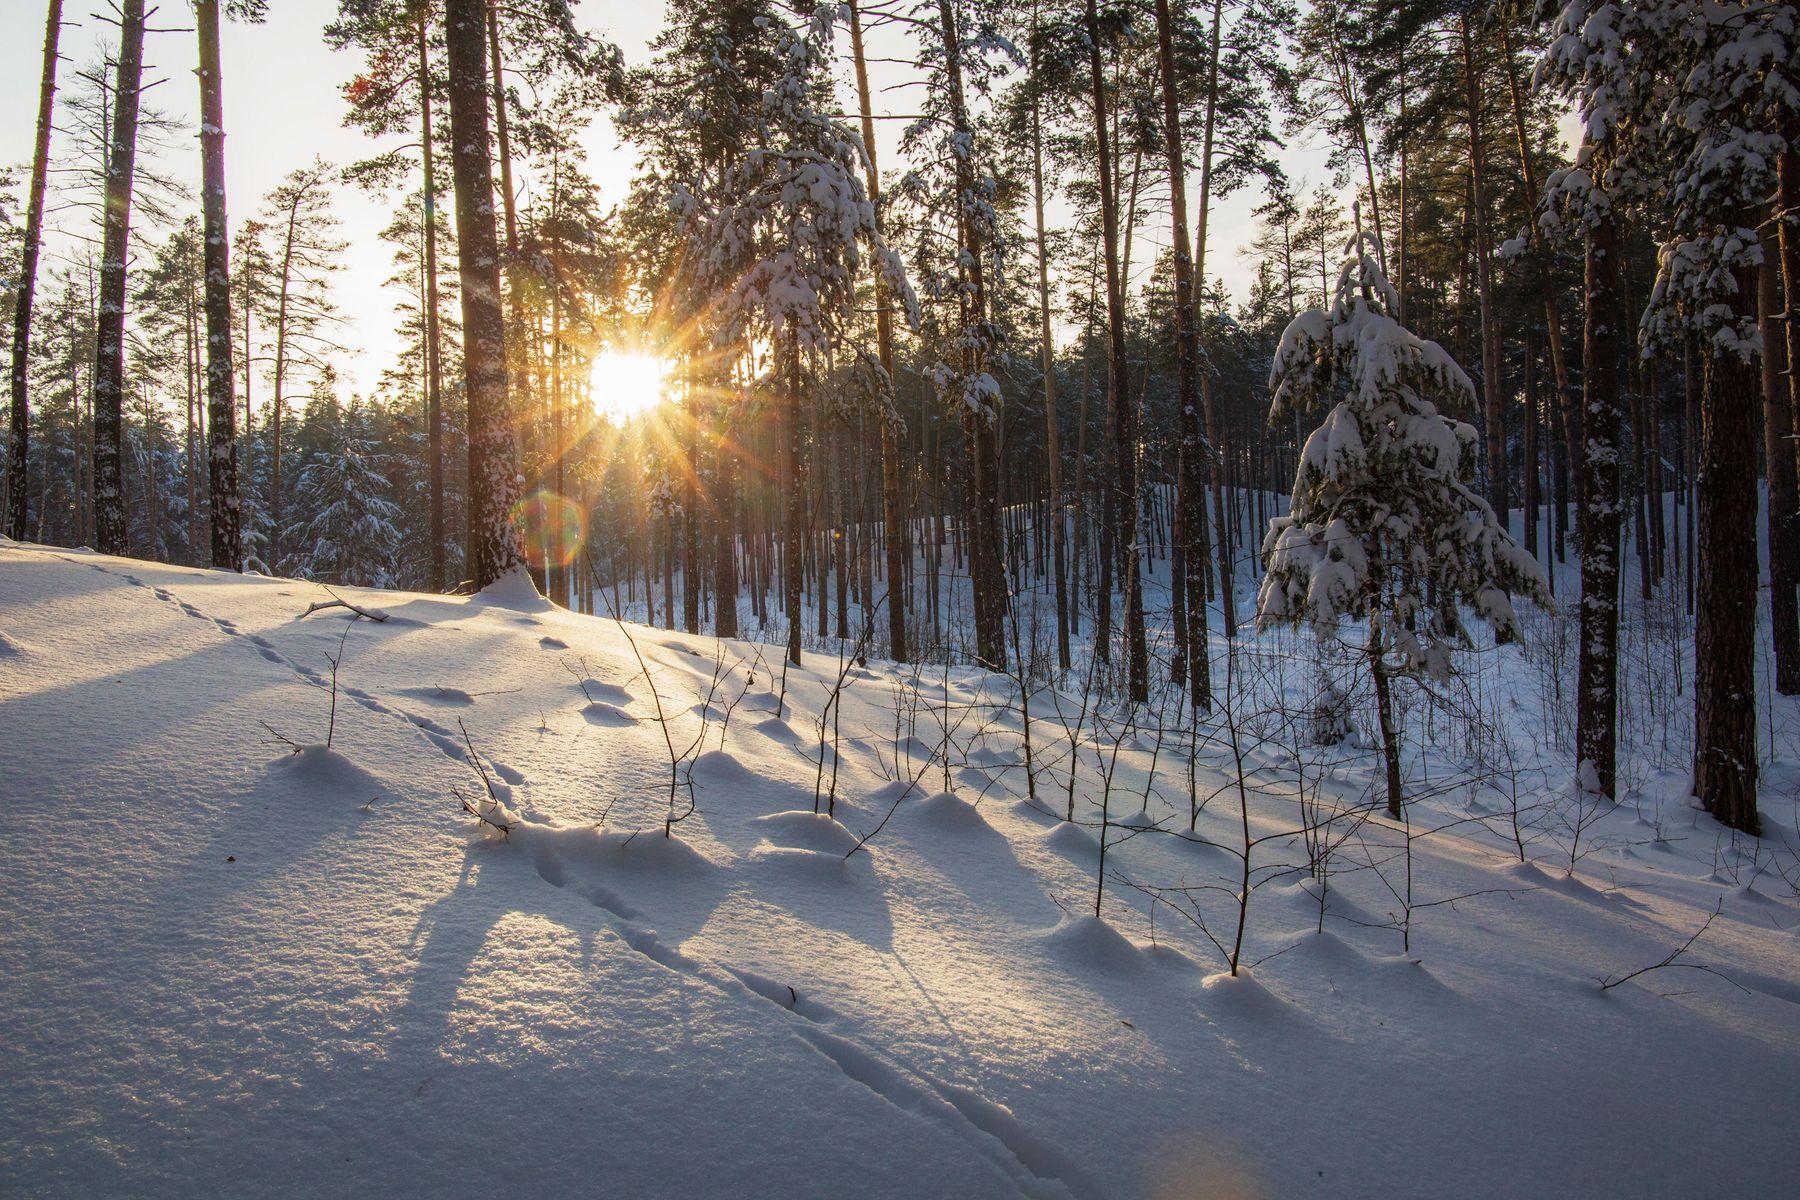 *** природа пейзаж зима.лес лесопарк лебяжье татарстан